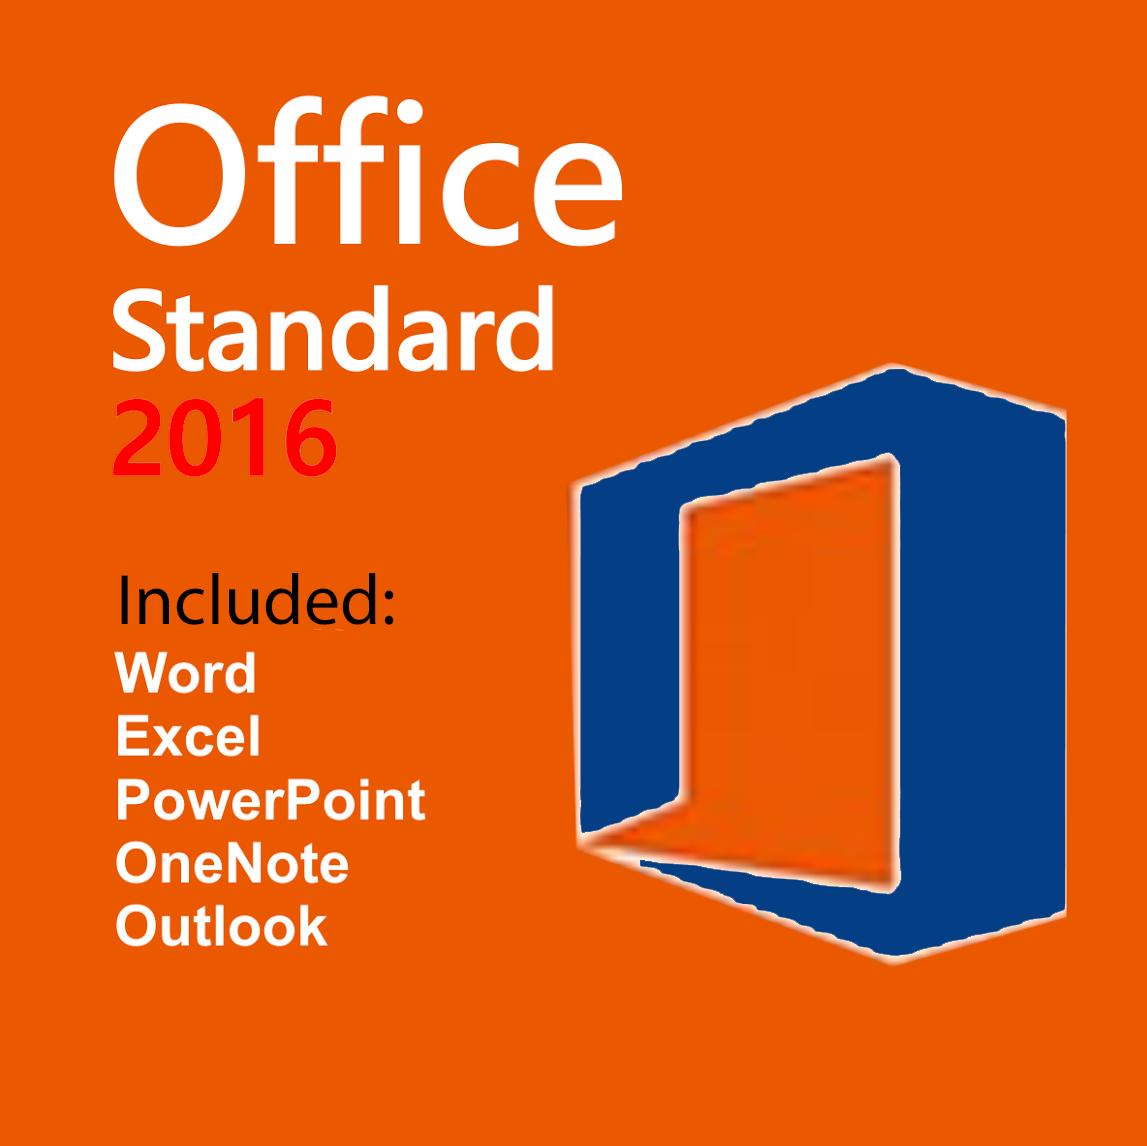 Download Office 2016 Standard